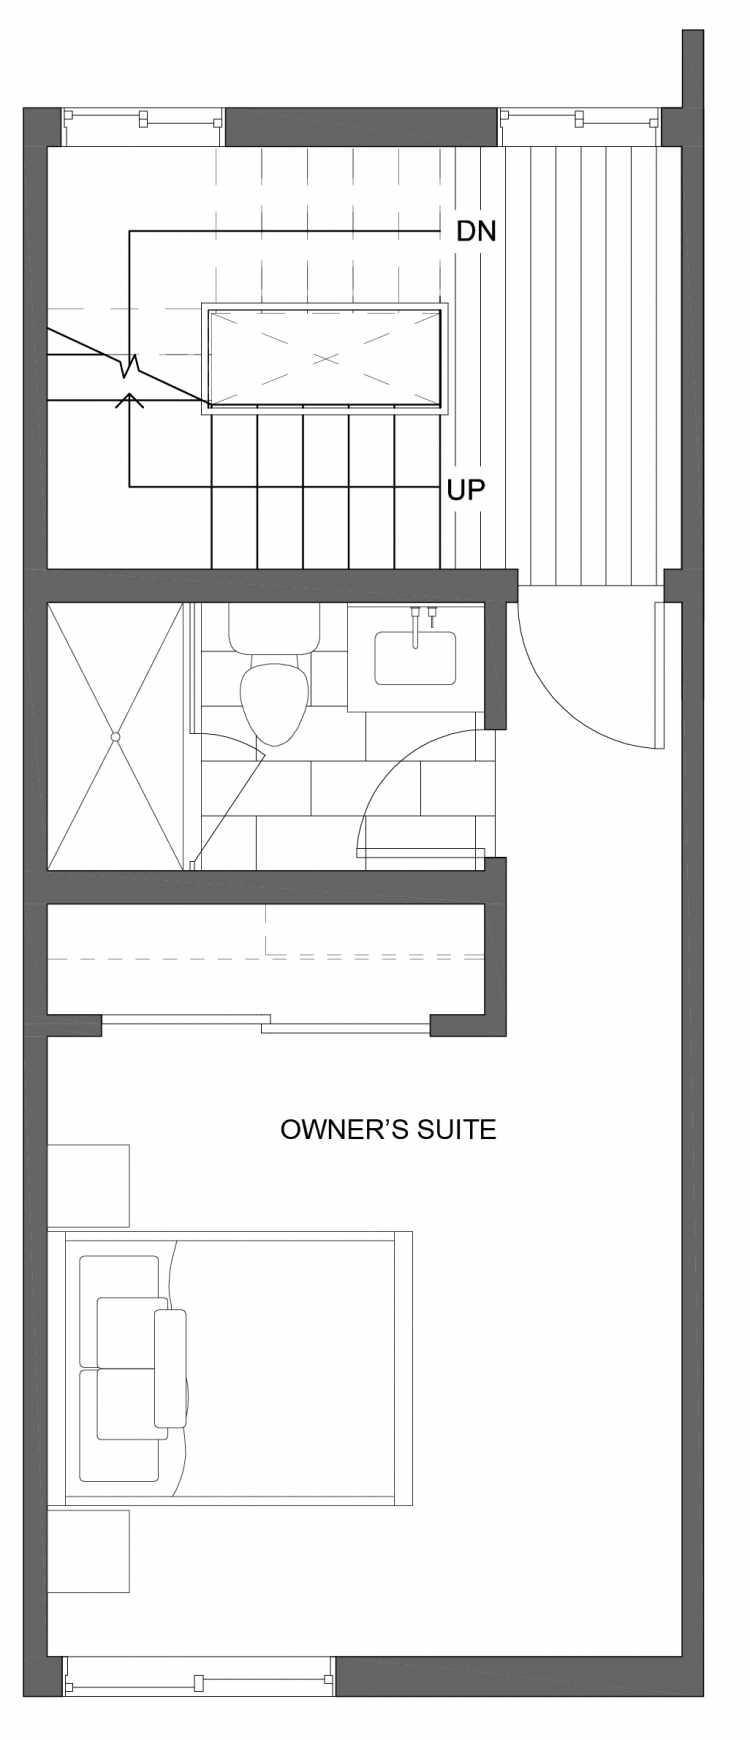 Third Floor Plan of 10429B Alderbrook Pl NW, One of the Jasmine Townhomes in the Greenwood Neighborhood of Seattle